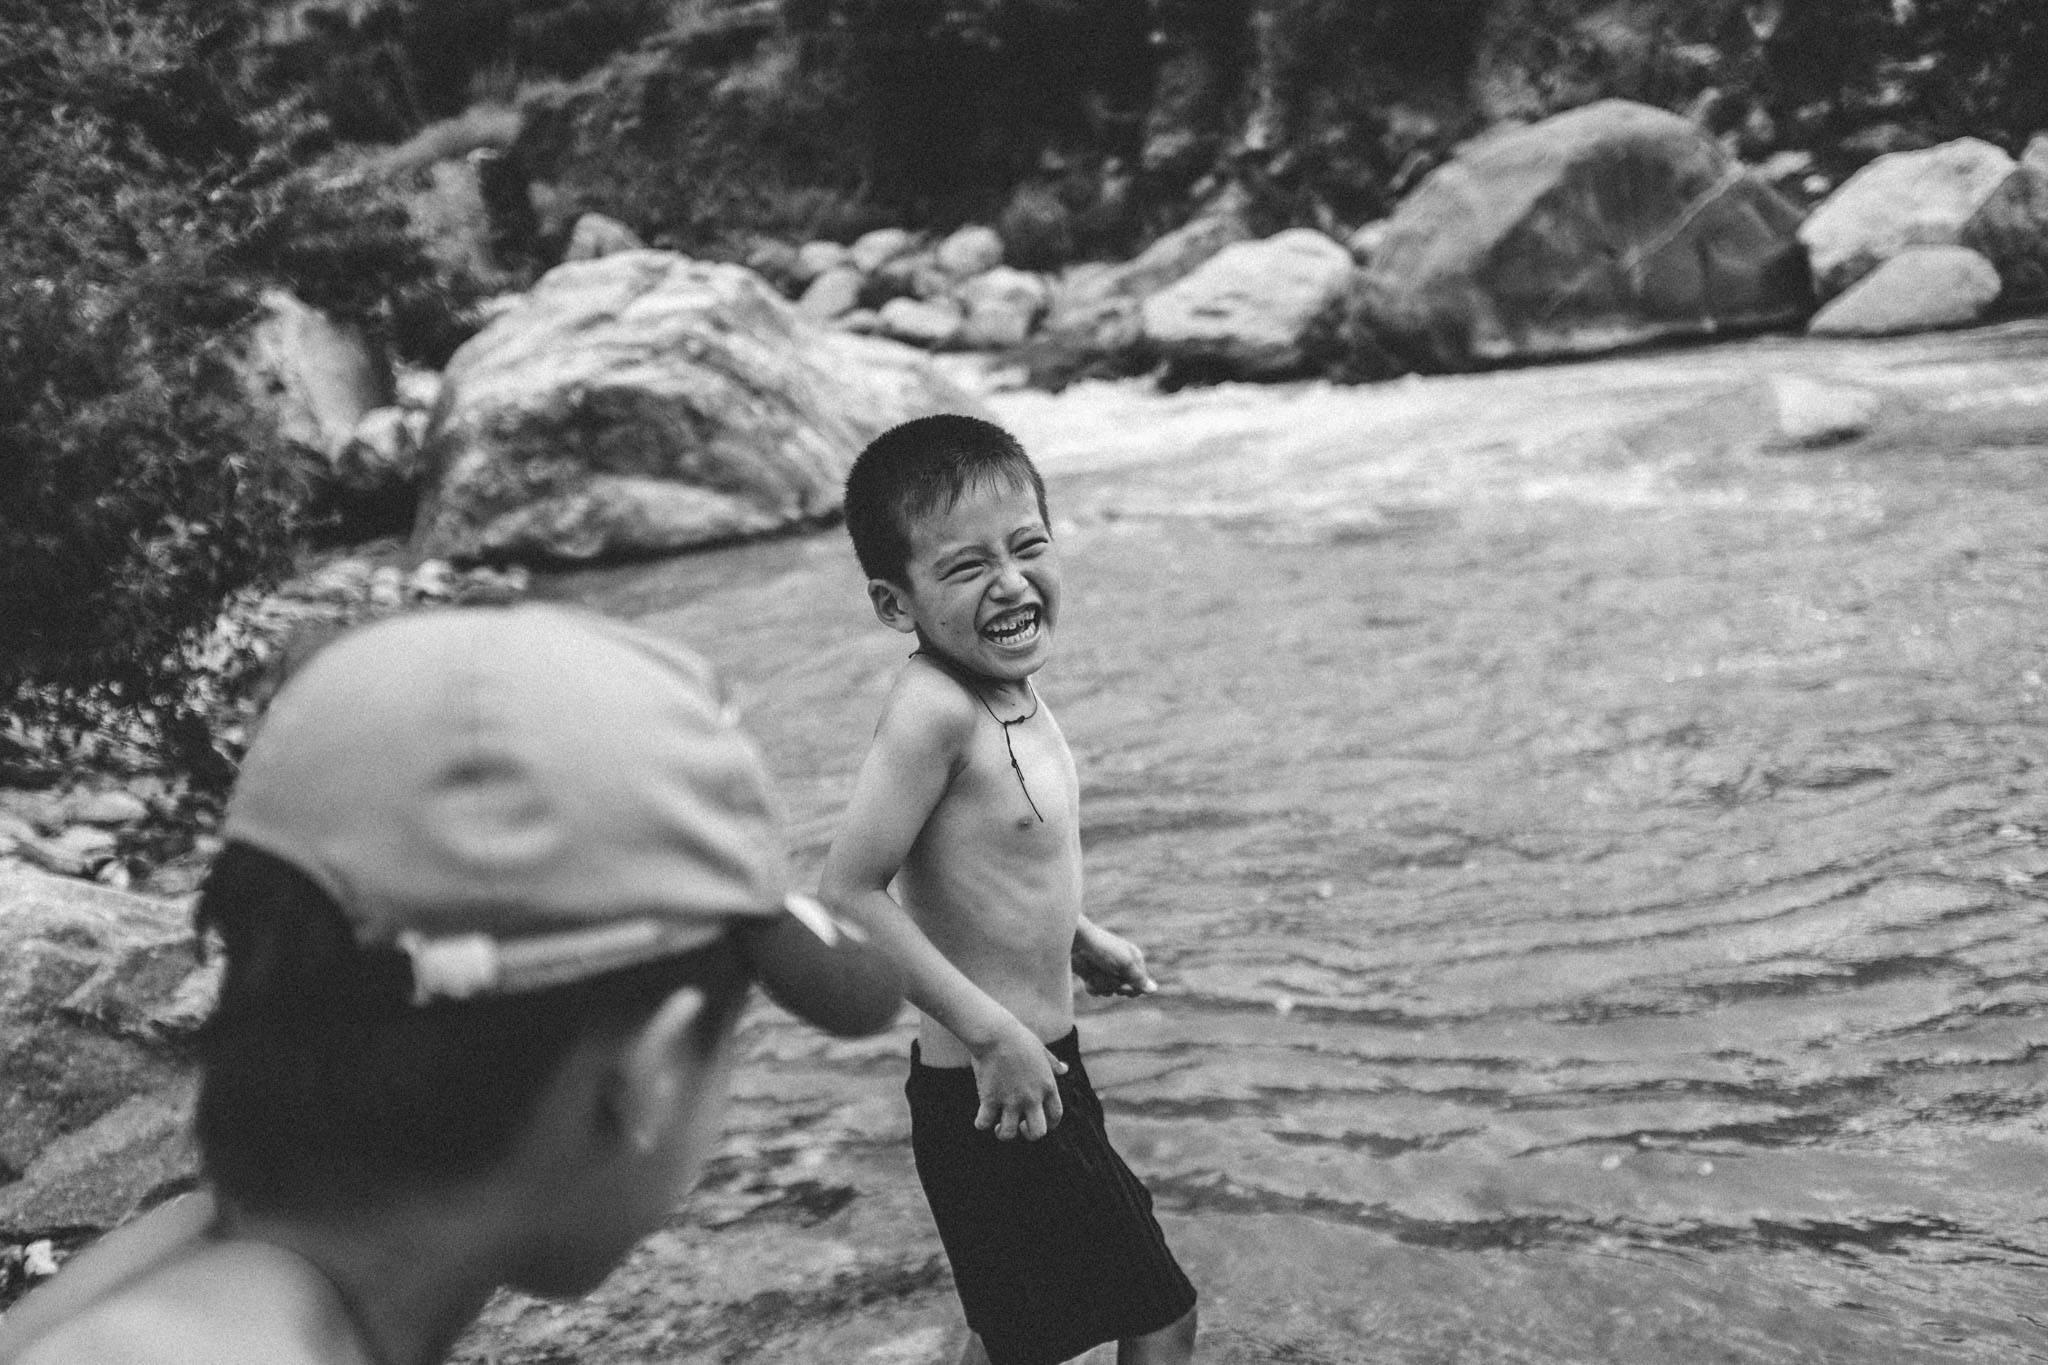 Cold river in Bhutan © Dylan Haskin